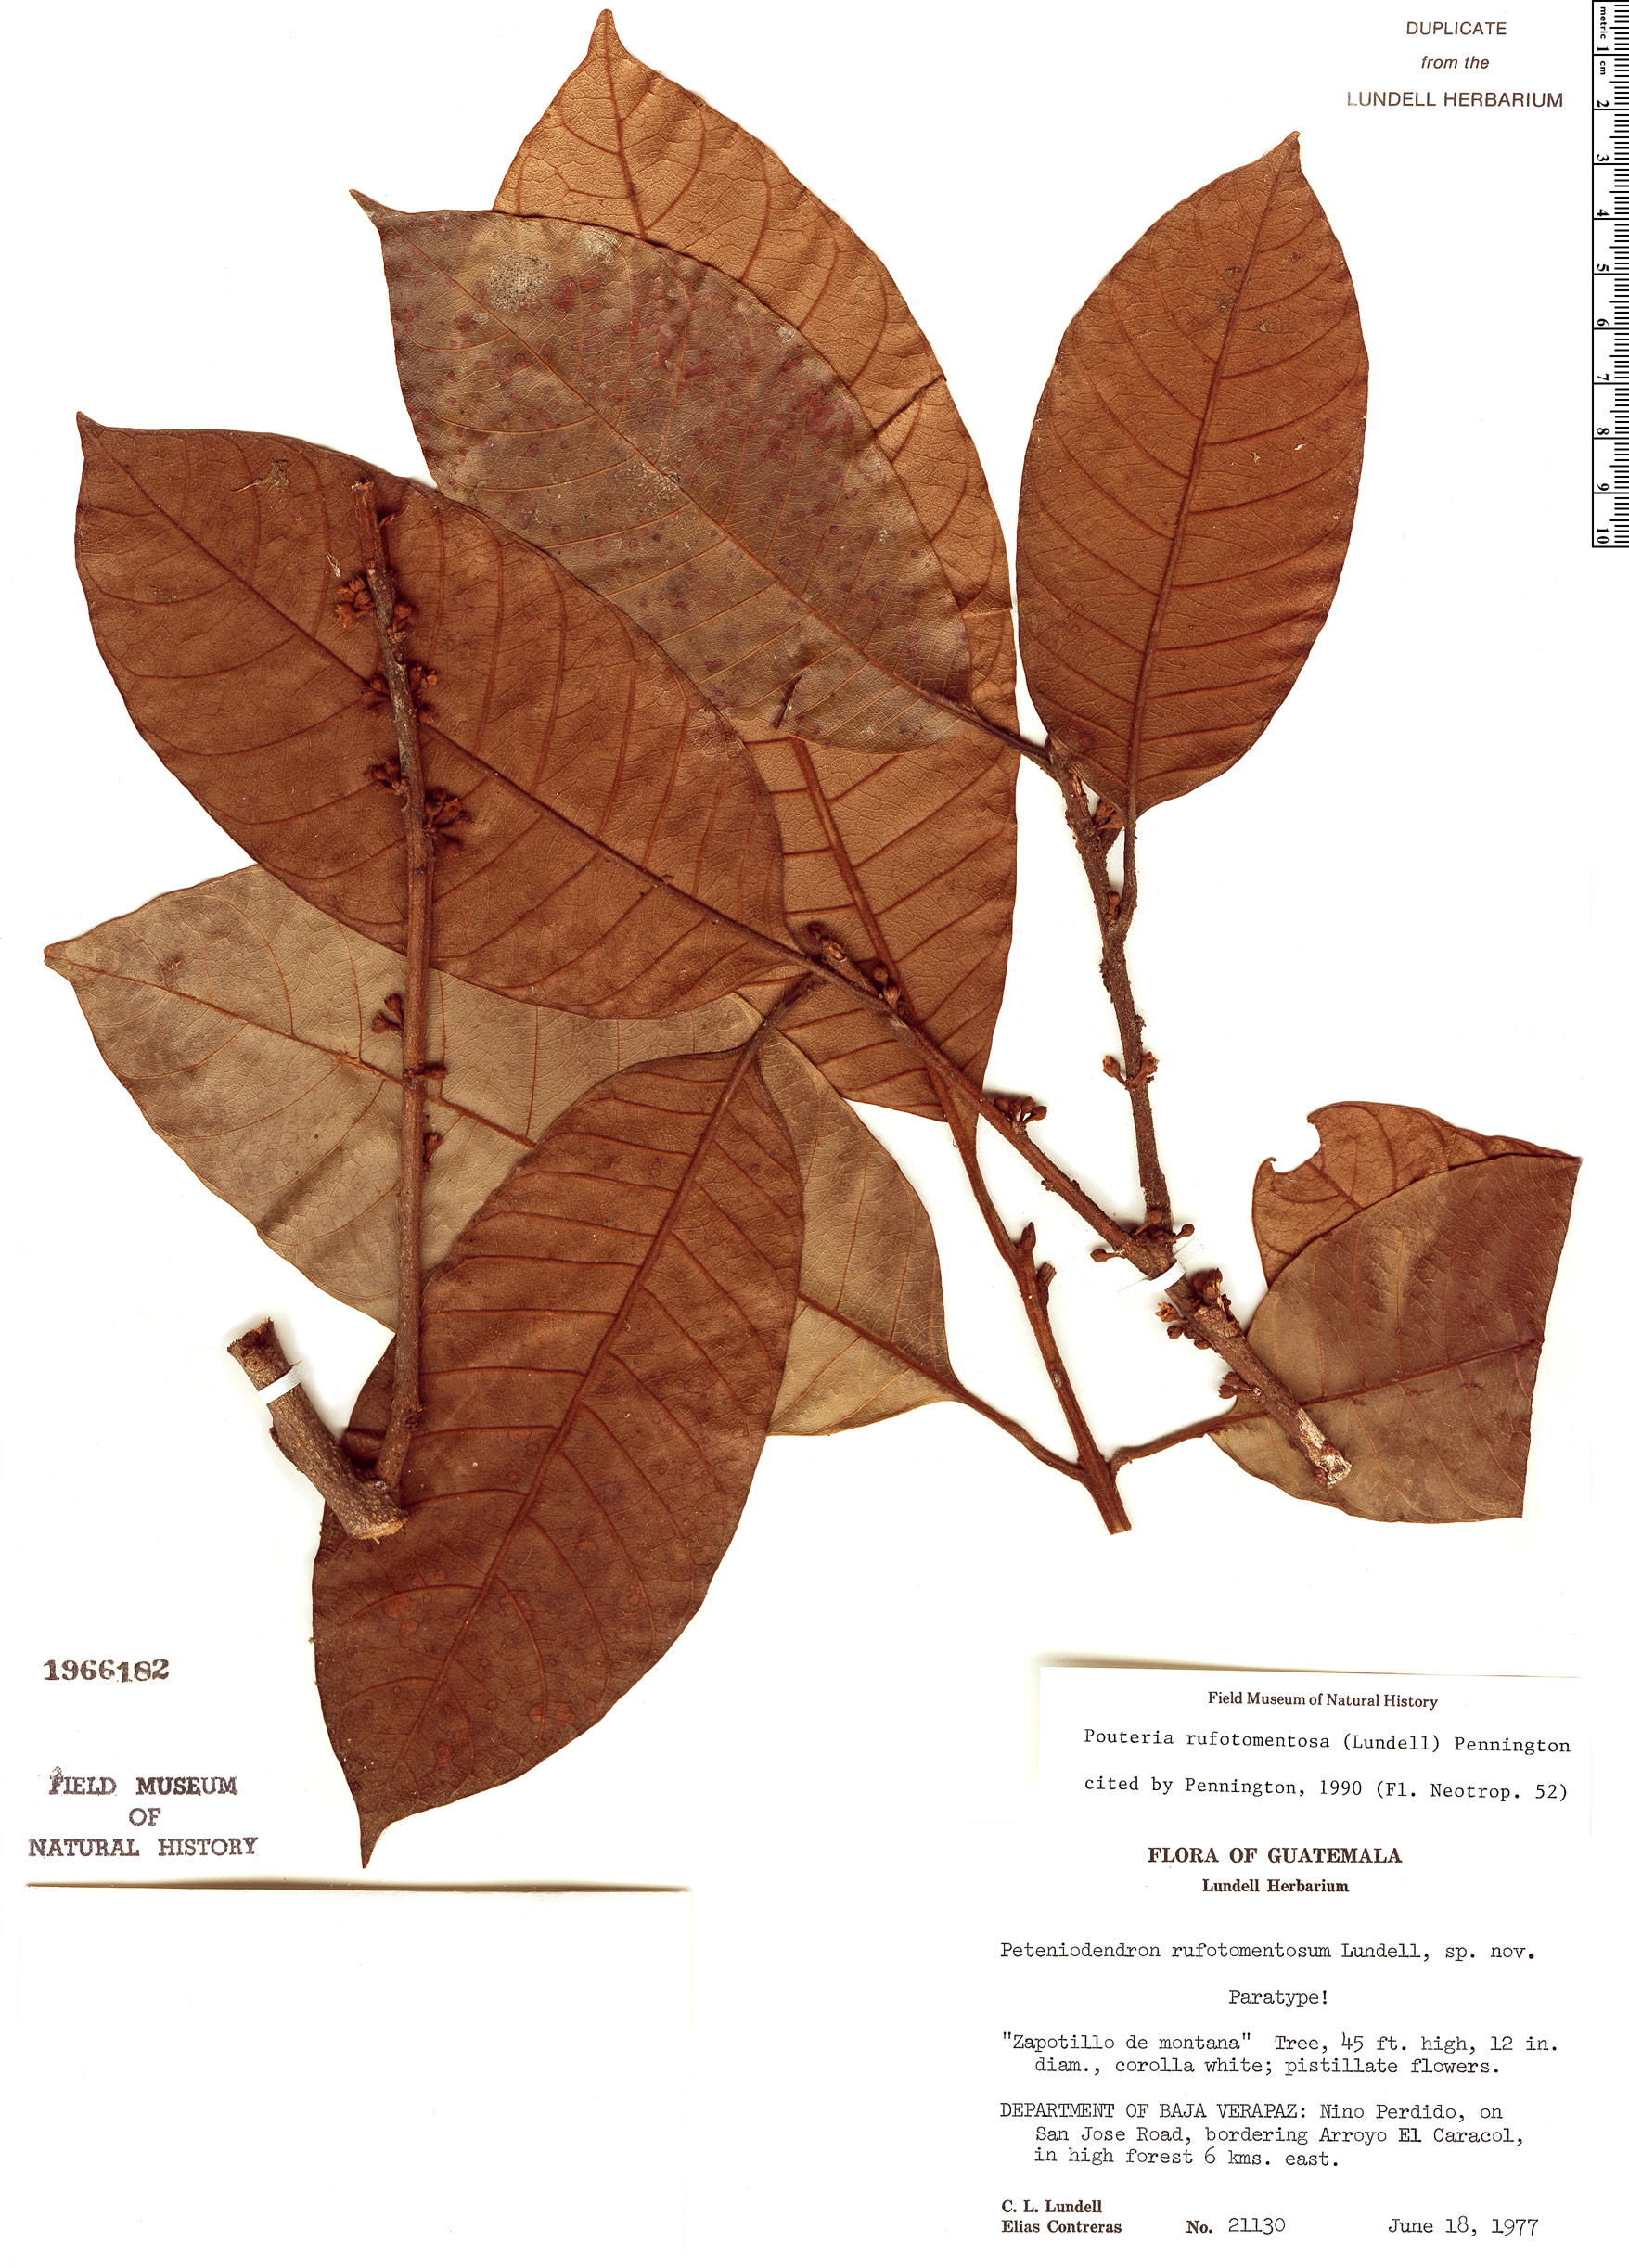 Specimen: Pouteria rufotomentosa